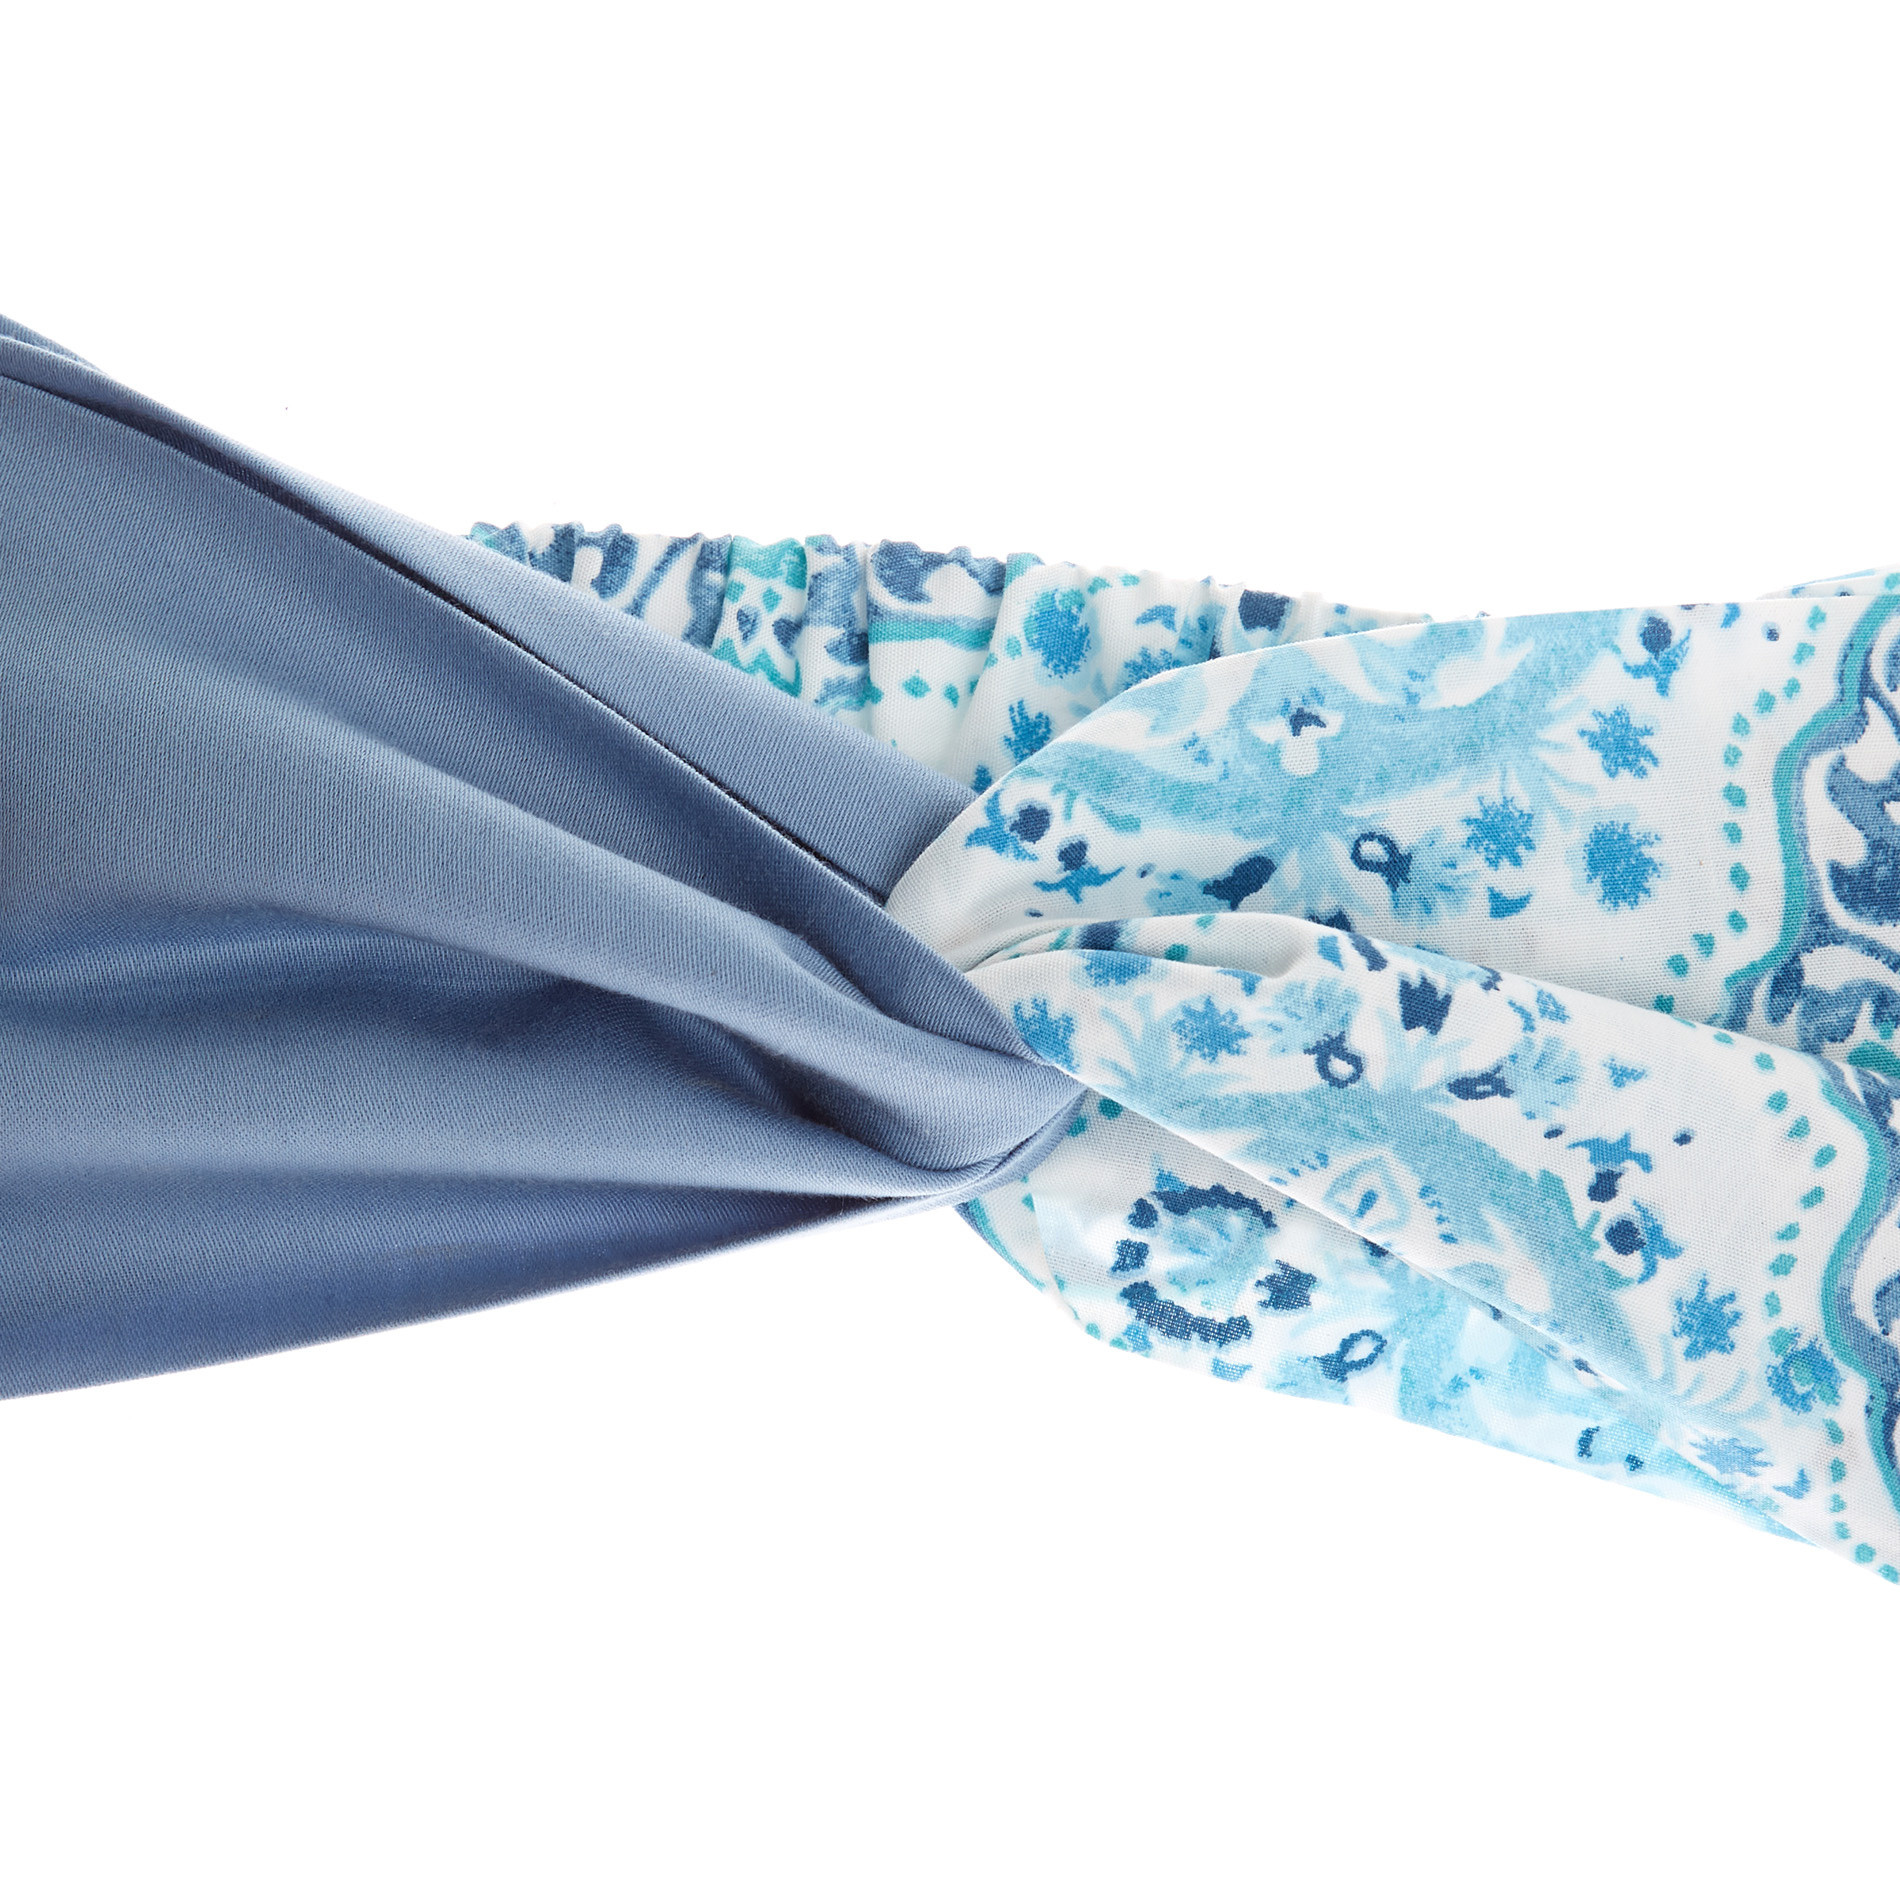 Fascia per capelli fantasia ornamentale, Azzurro, large image number 2